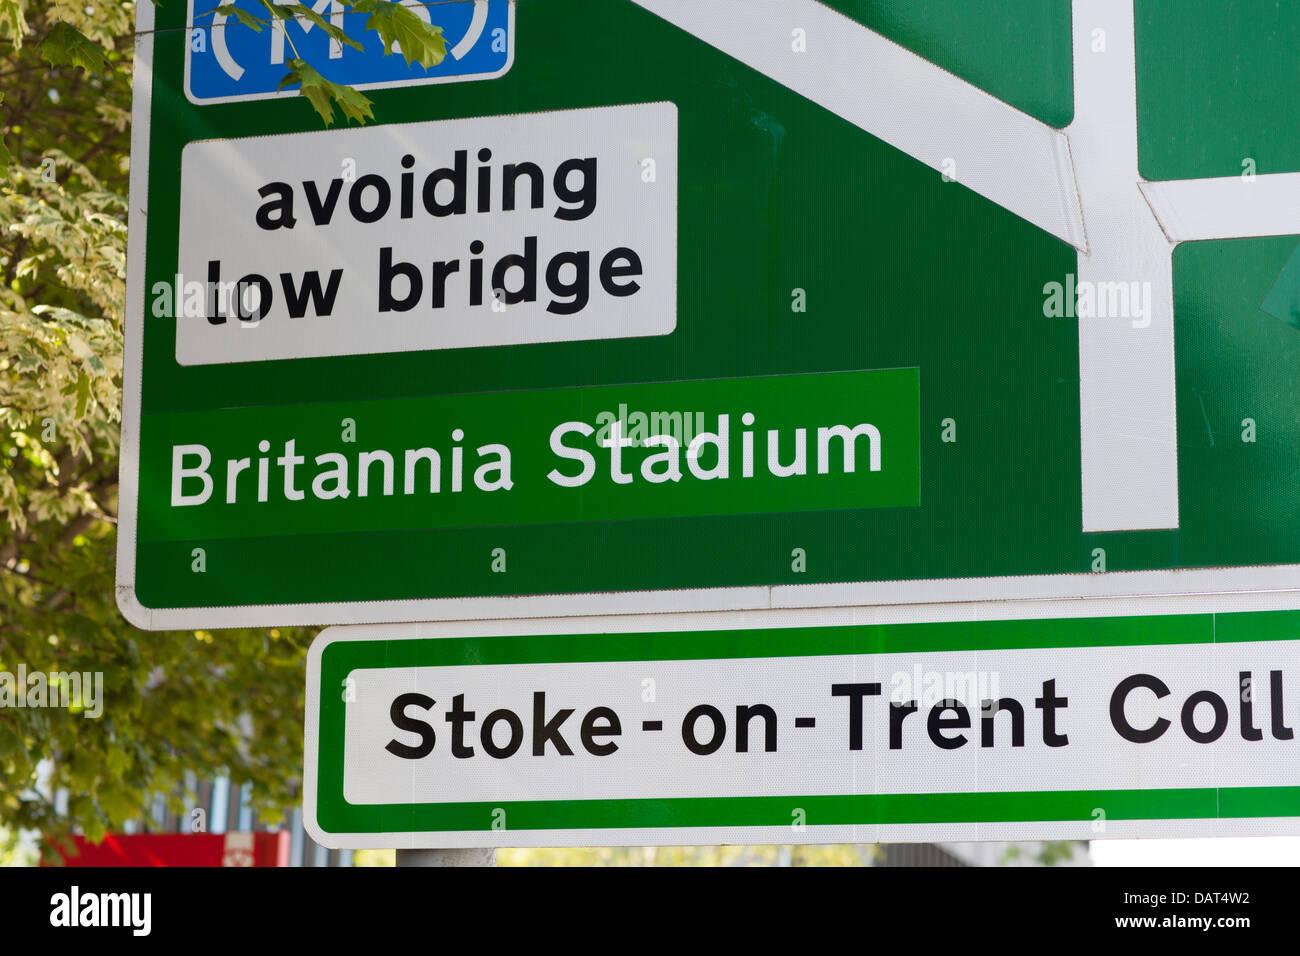 Sign in Stoke on Trent saying Britannia Stadium ( home of Stoke City FC ) avoiding low bridge ,Stoke on Trent College - Stock Image